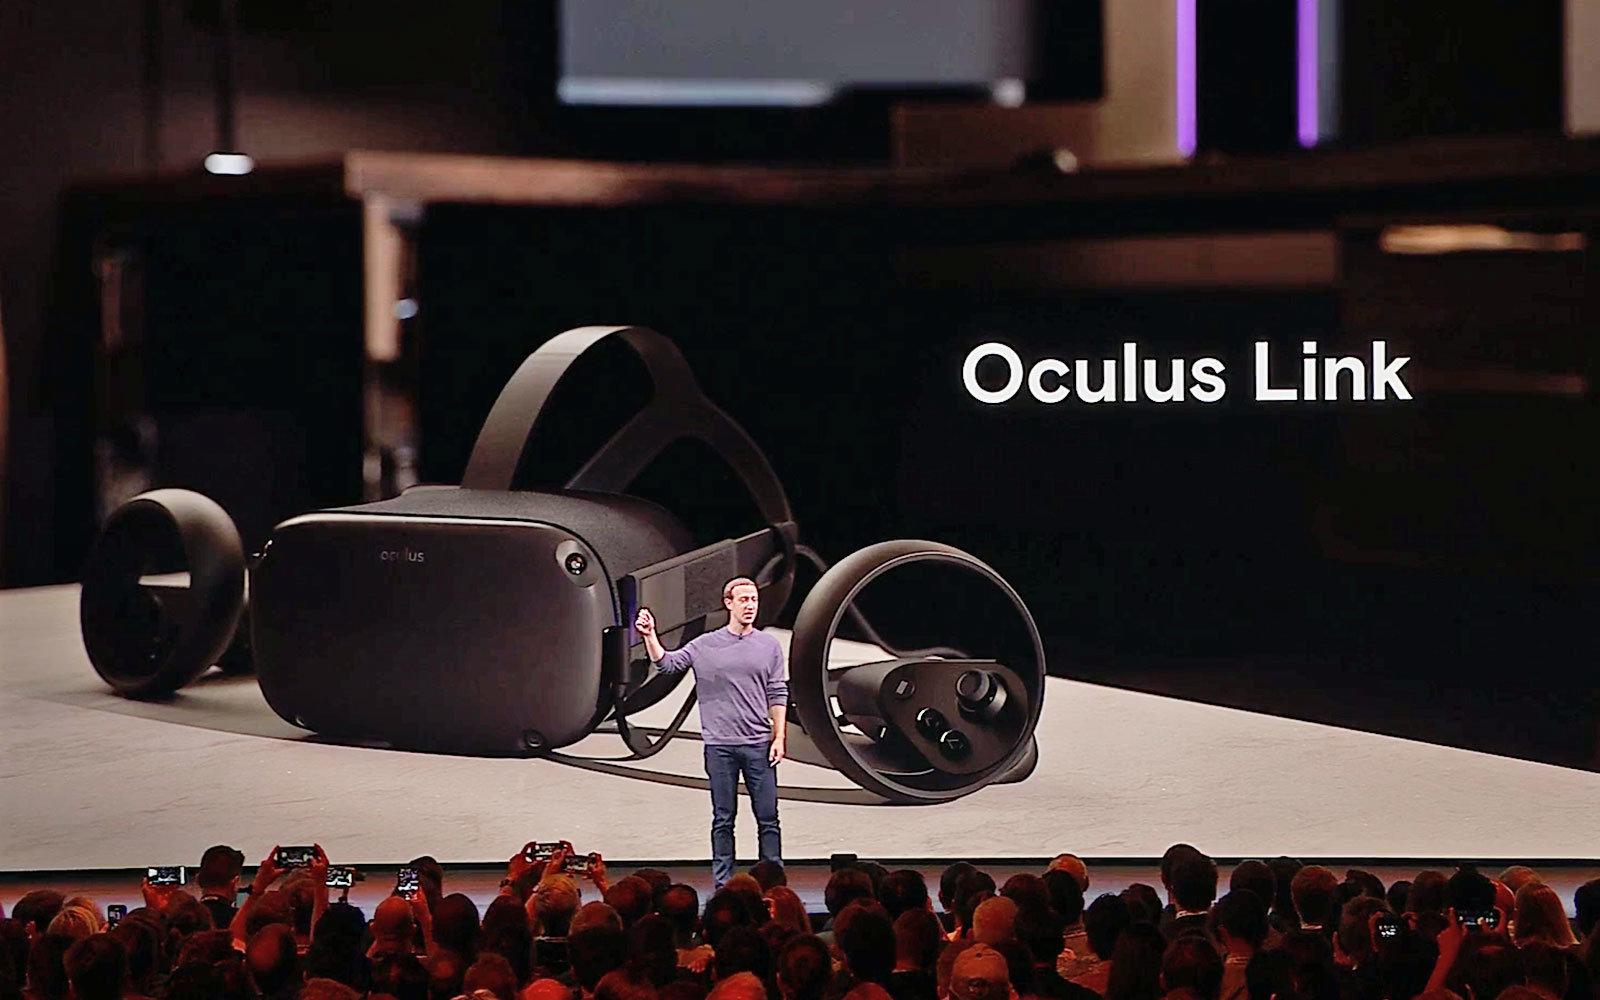 Oculus Link announcement